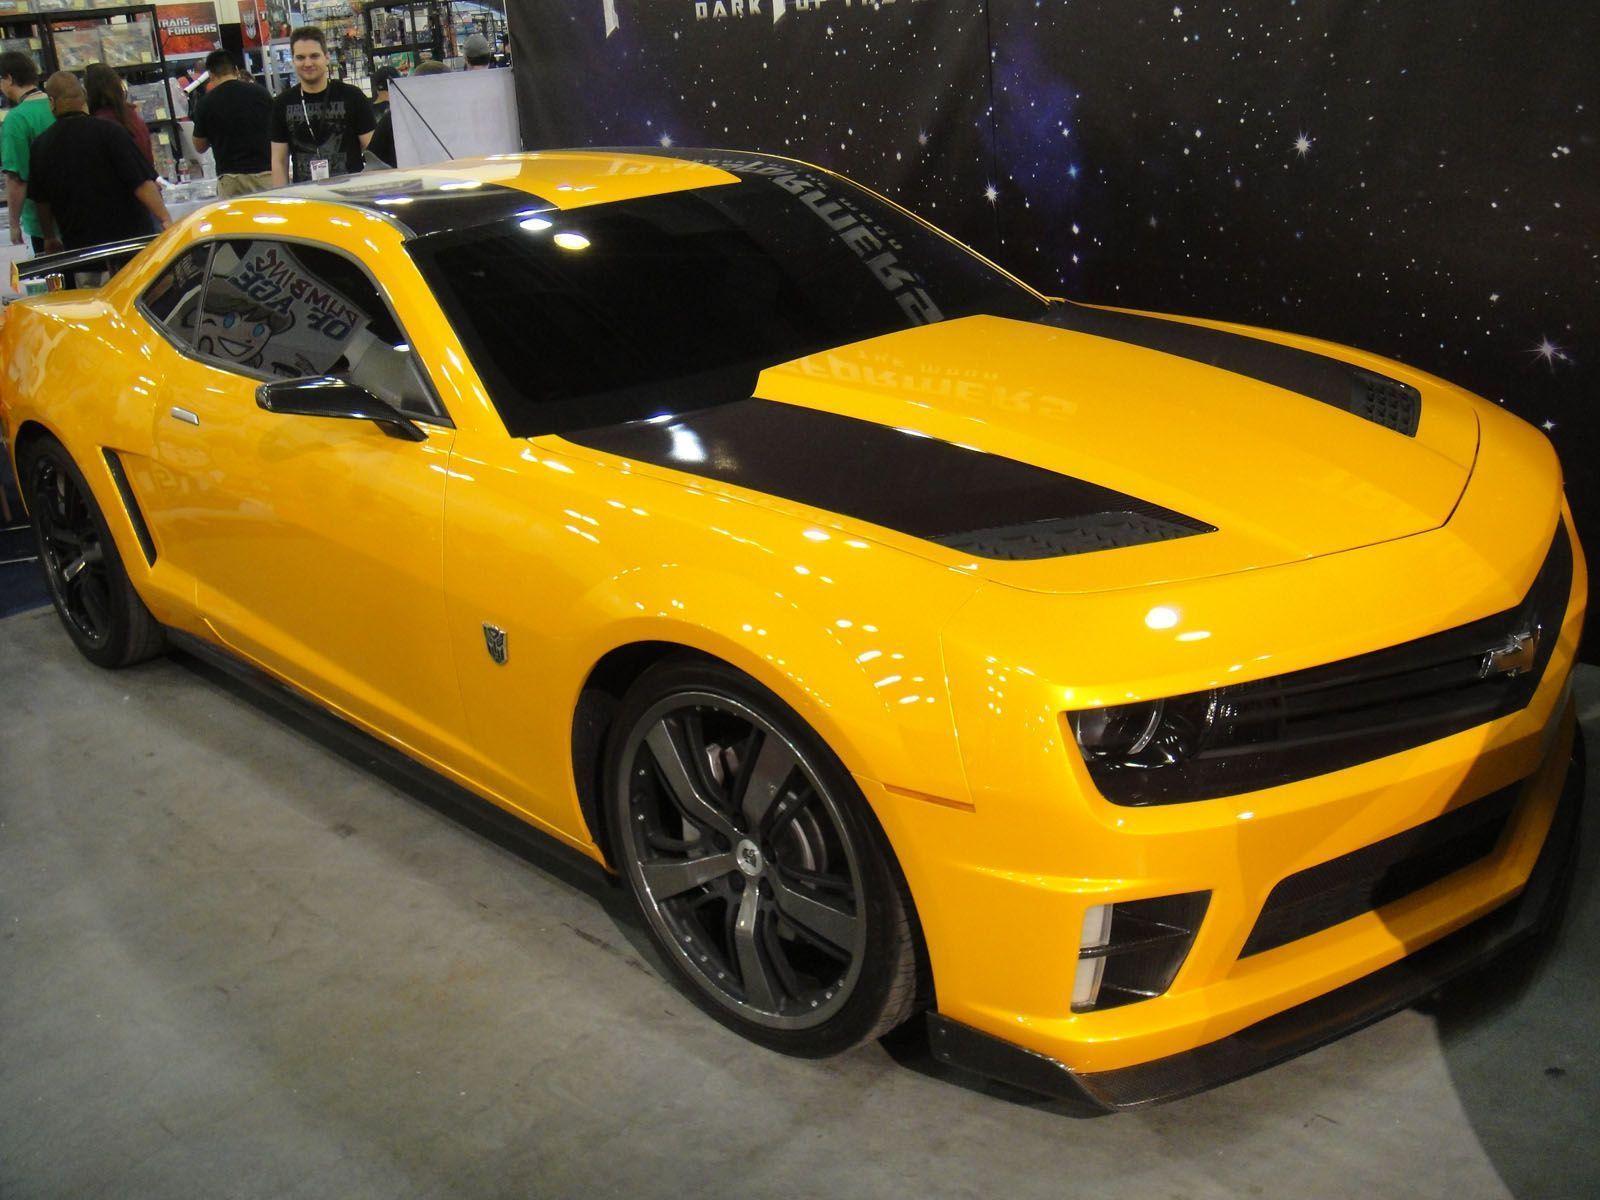 Most Popular Classic Cars In Australia